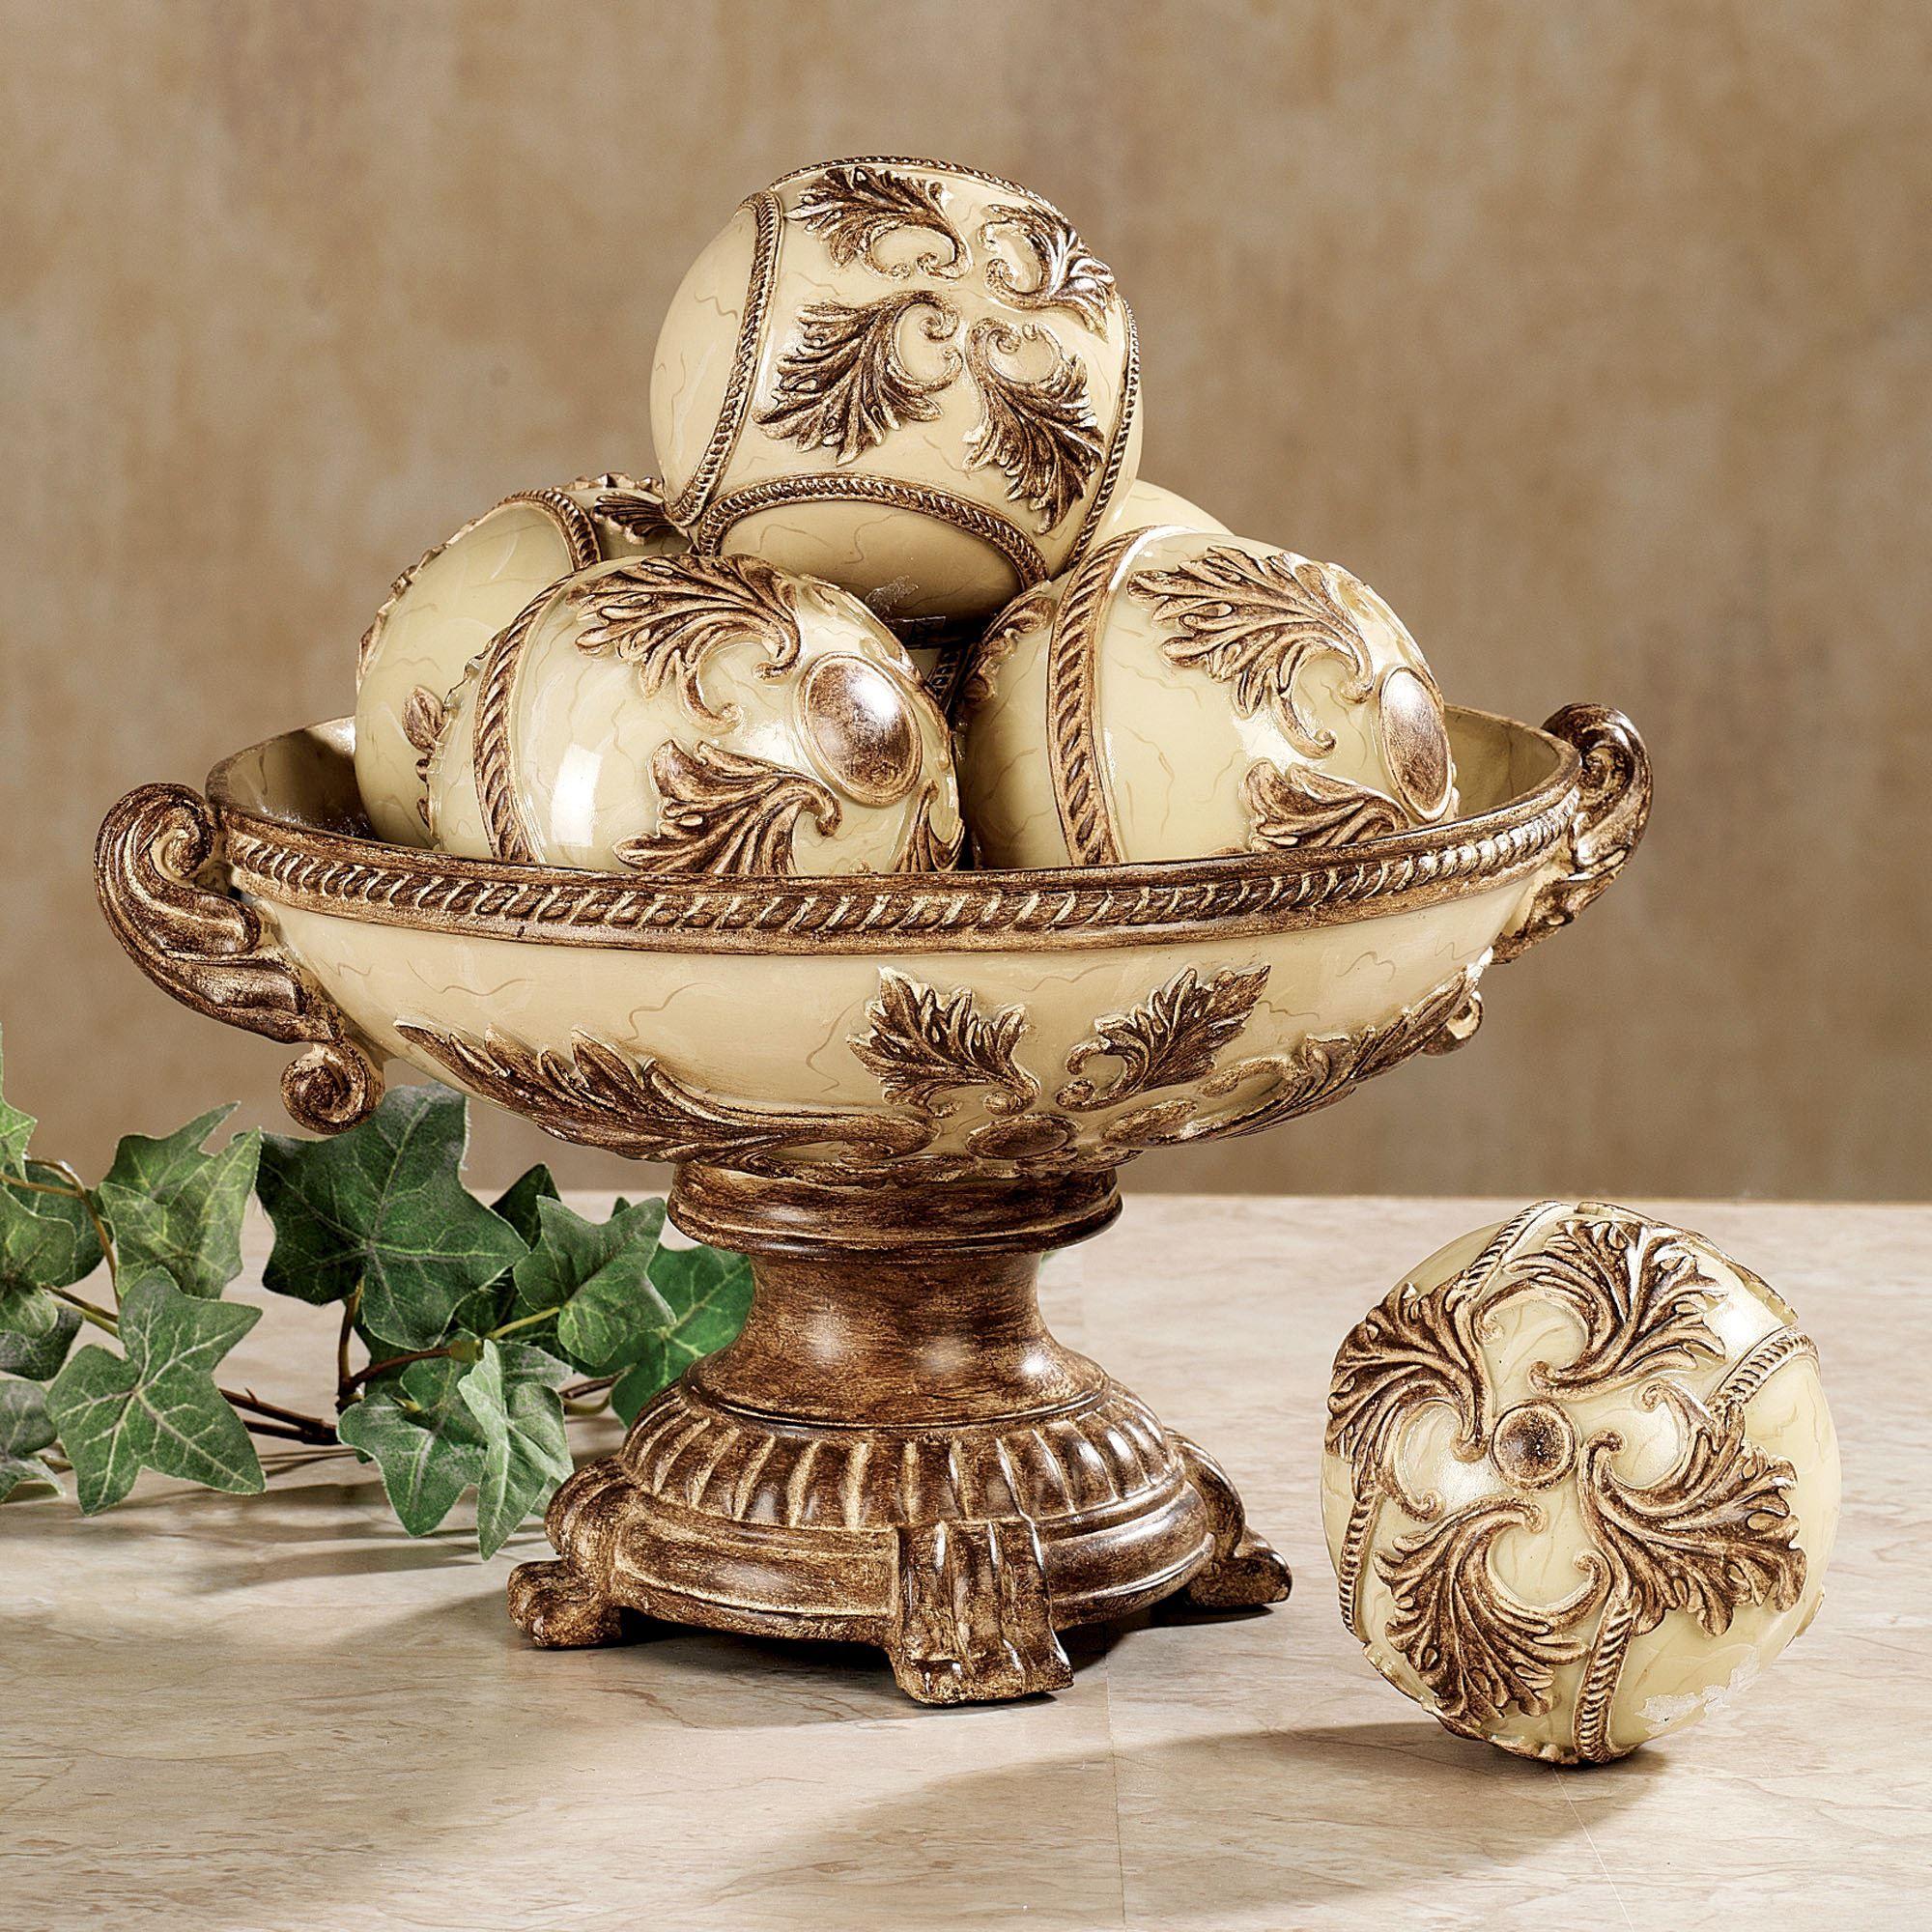 Decorative Balls For Bowls Vinelle Decorative Balls  Bowls Decorating And Pedestal